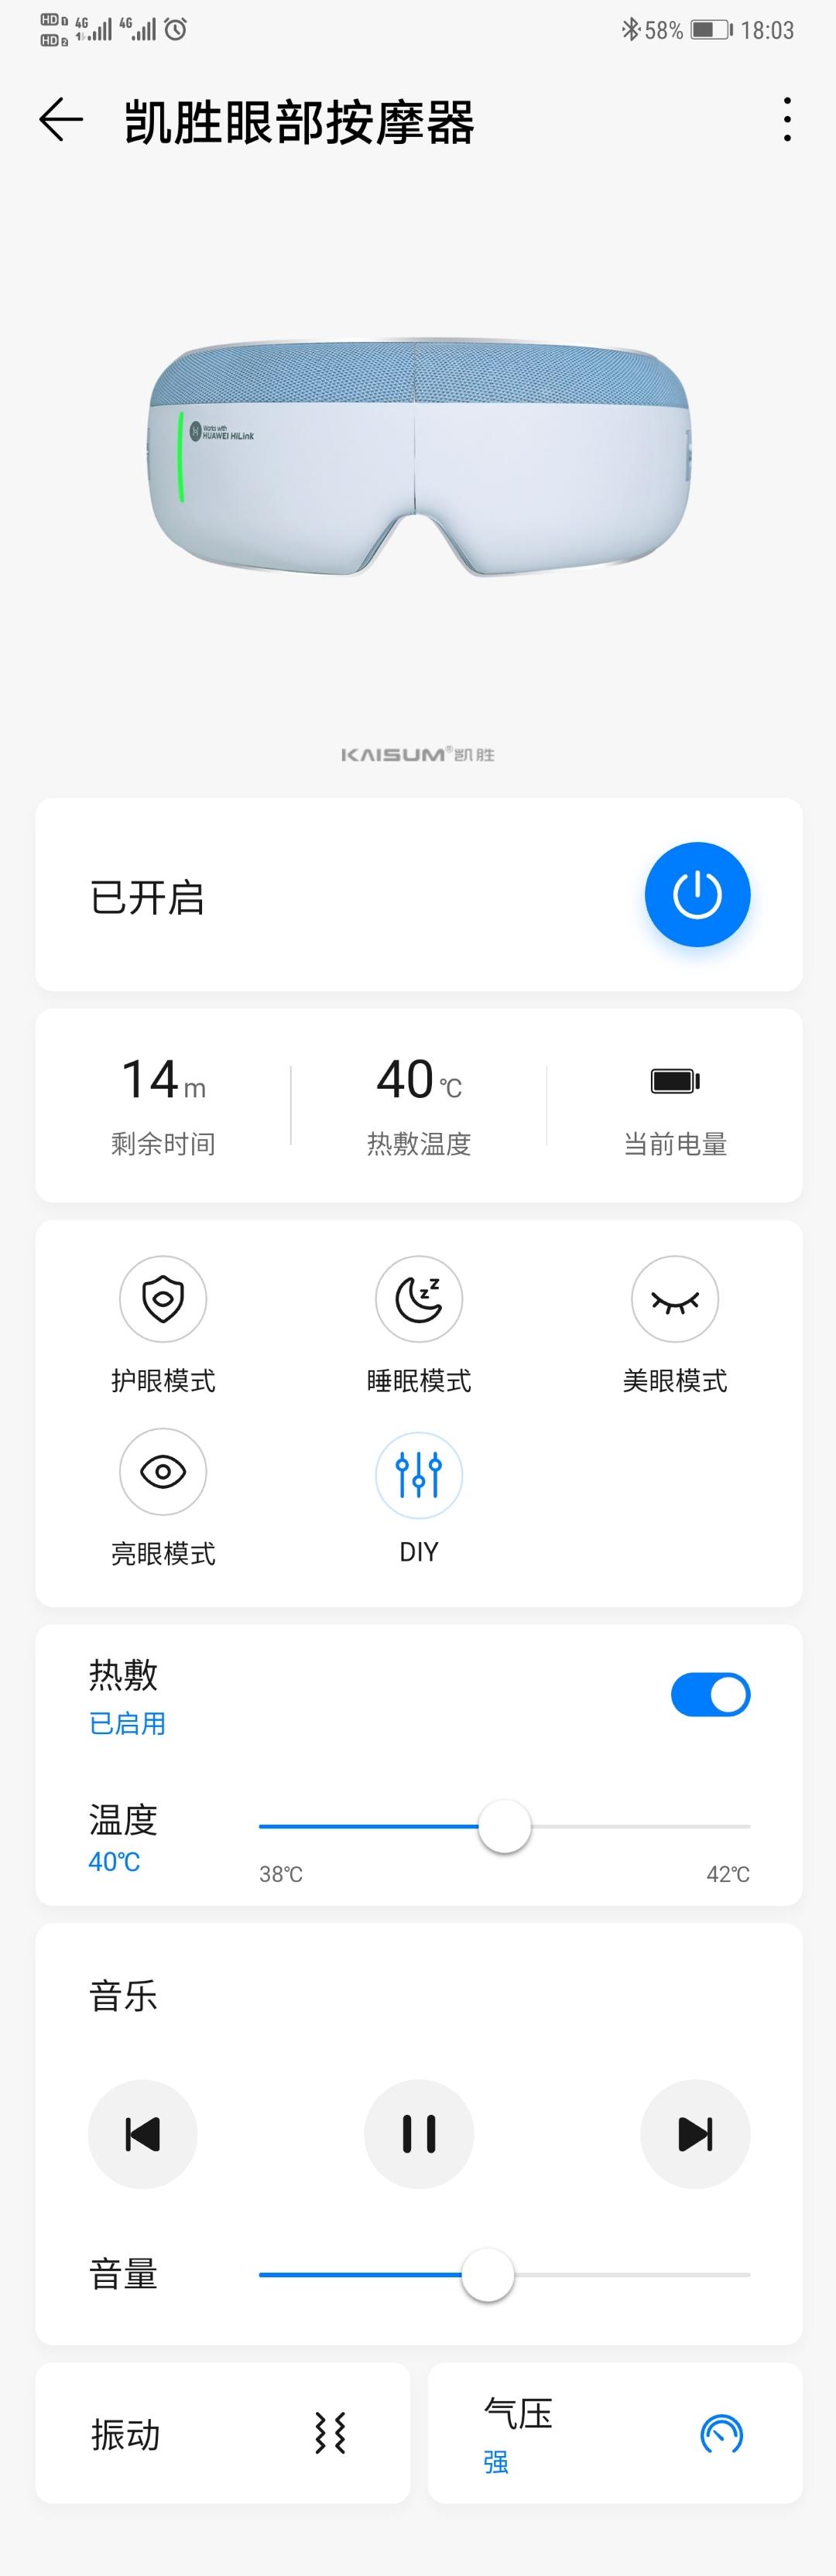 Screenshot_20210415_180330_com.huawei.smarthome.jpg